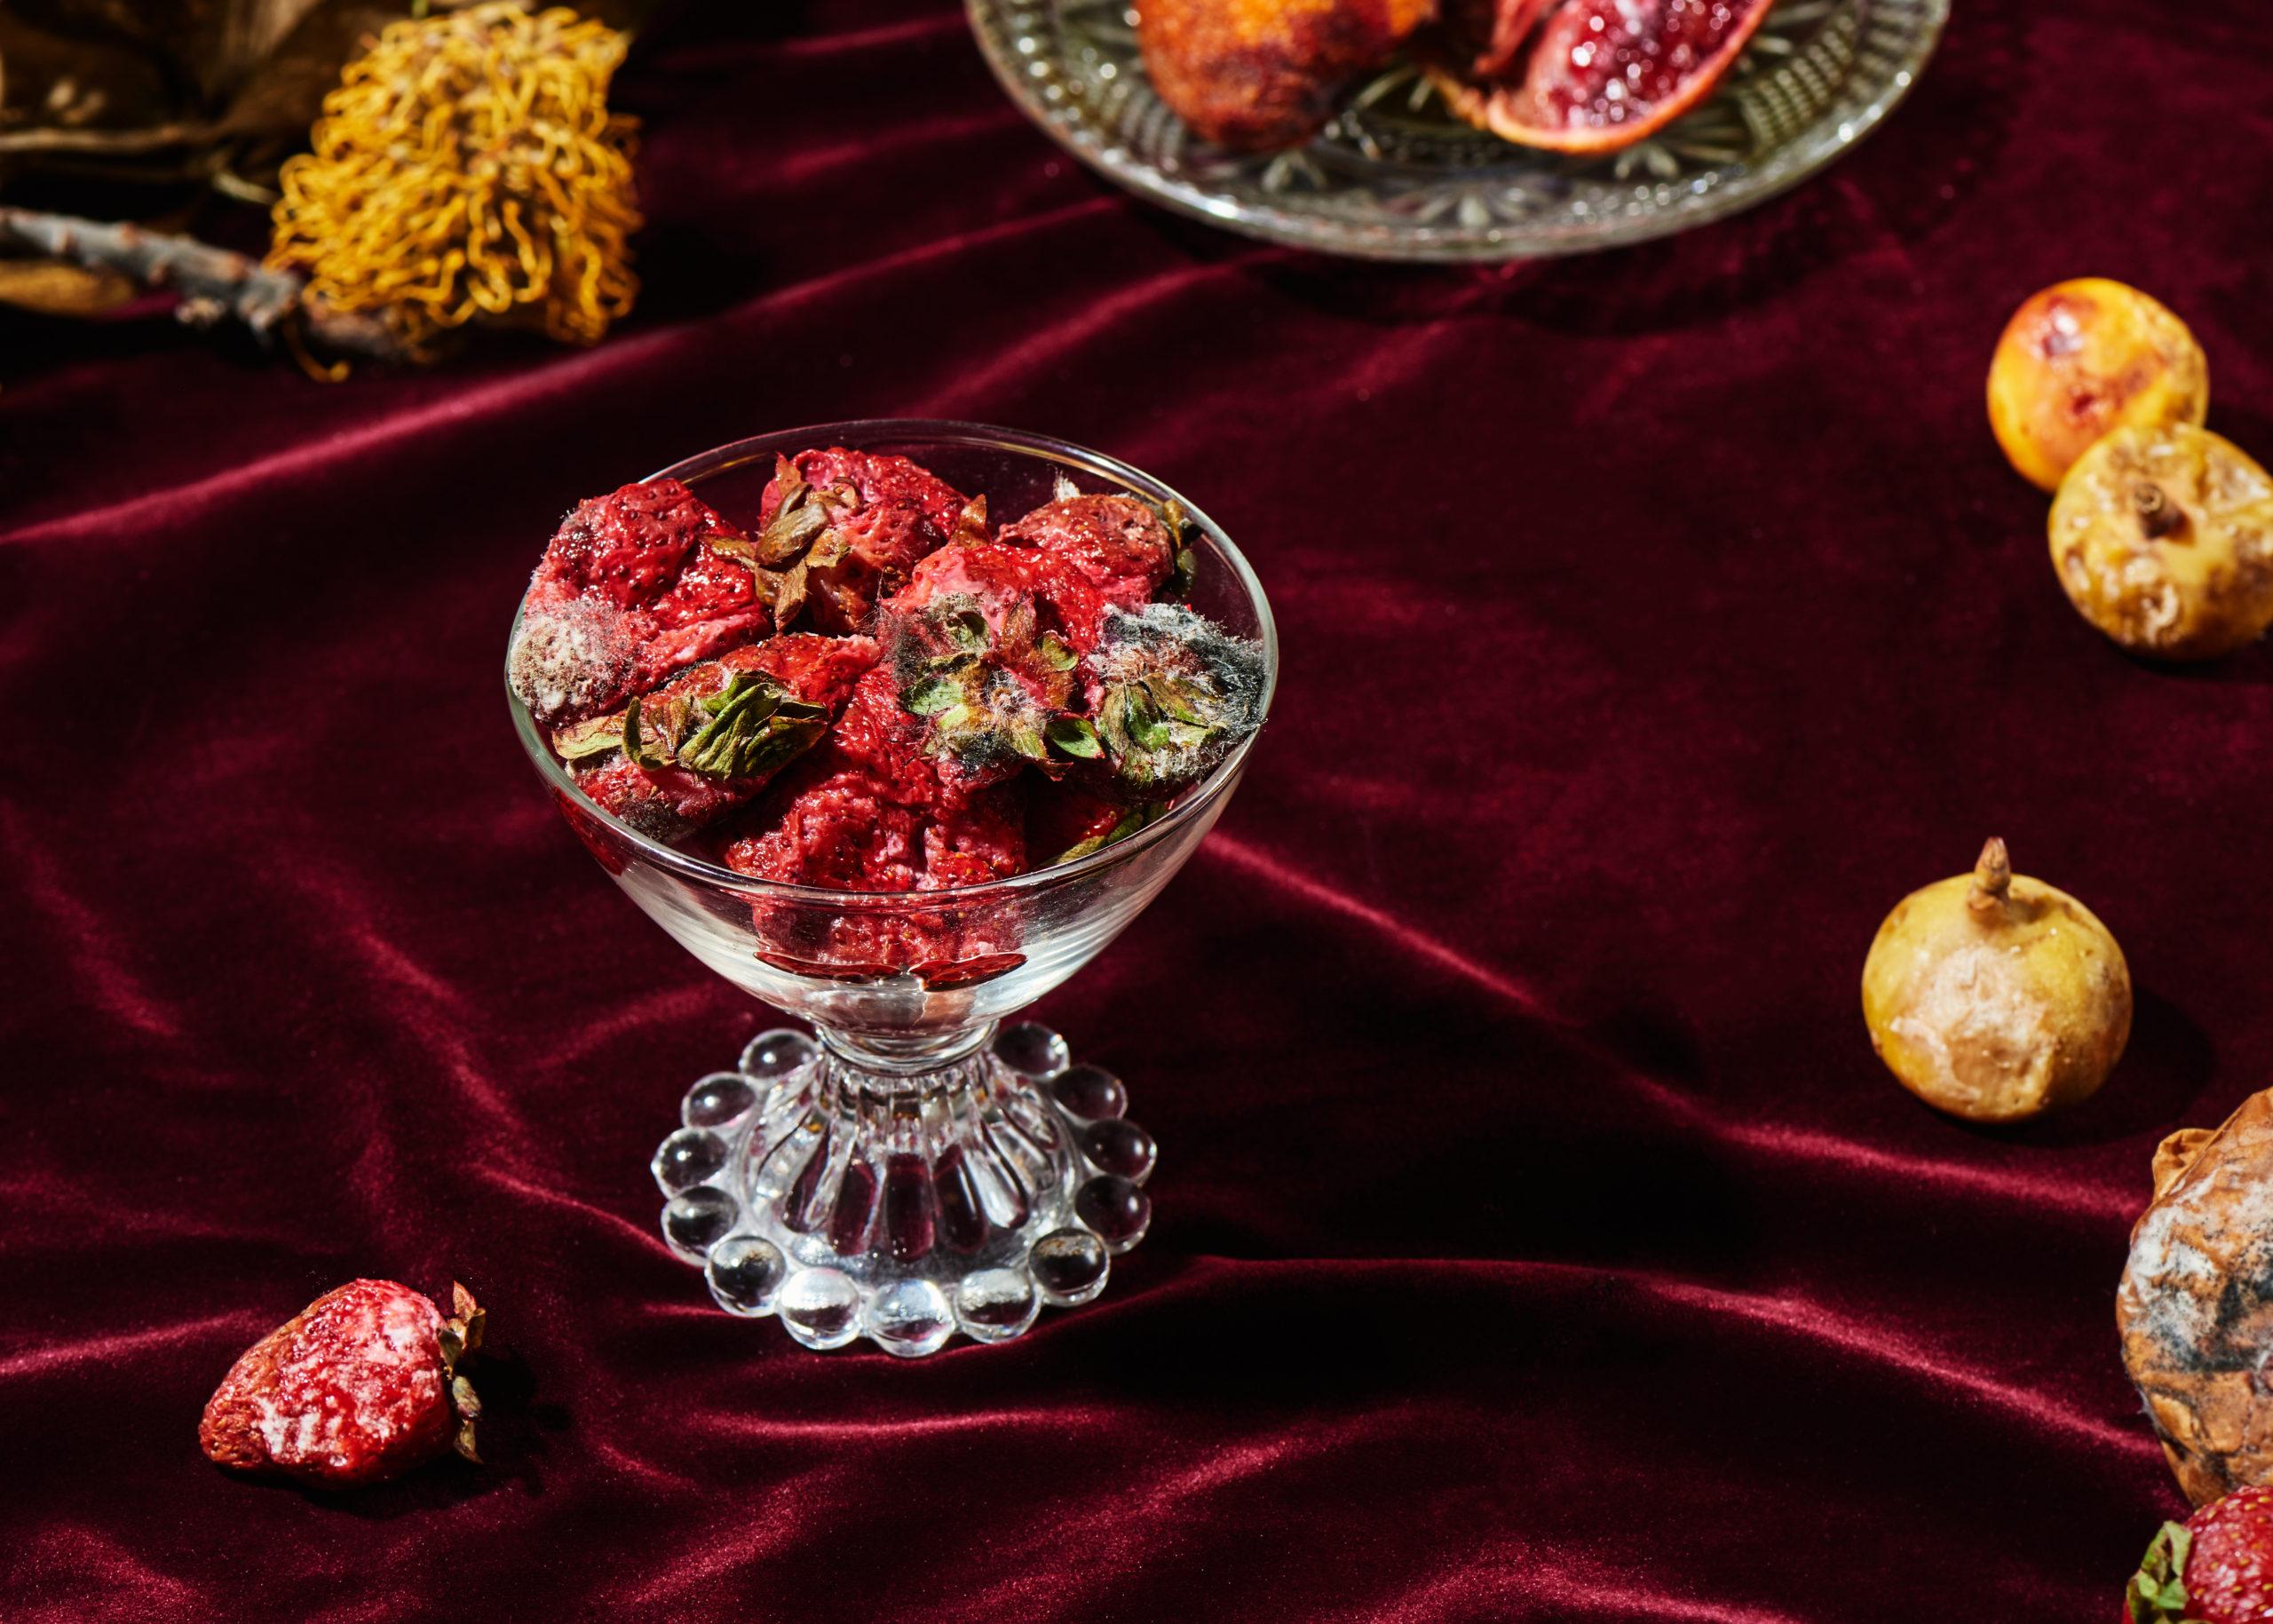 Spoiled Rotten – Fruit Scene – Yasara Gunawardena